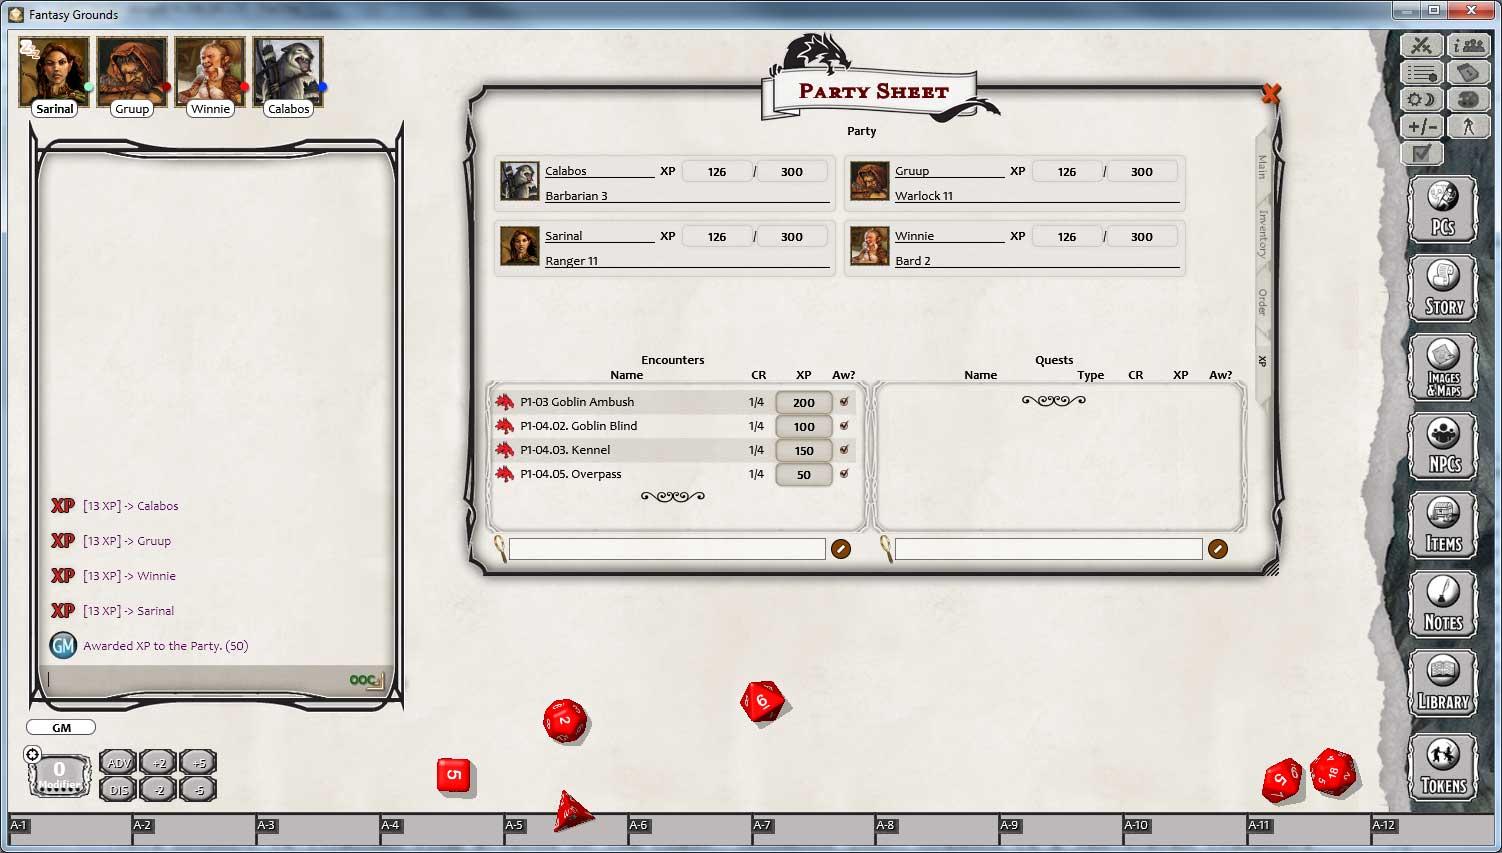 D&D Lost Mine of Phandelver for Fantasy Grounds